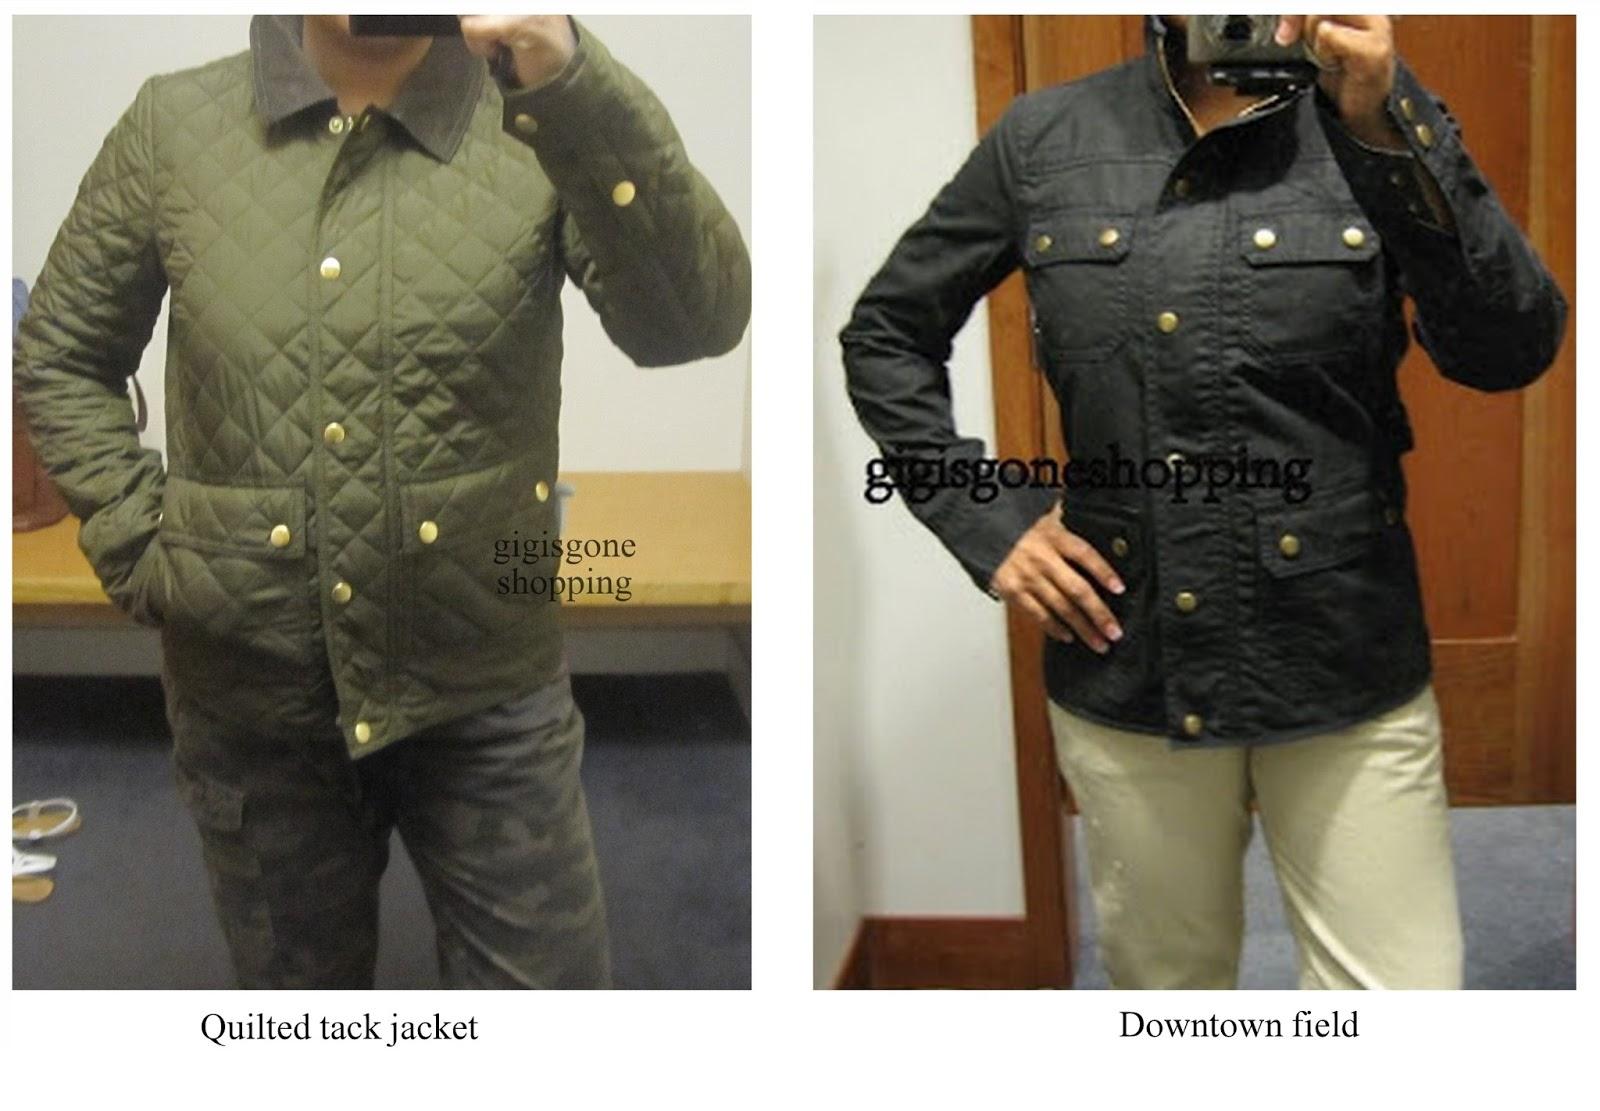 J Crew Quilted Tack Jacket Gigi S Gone Shopping